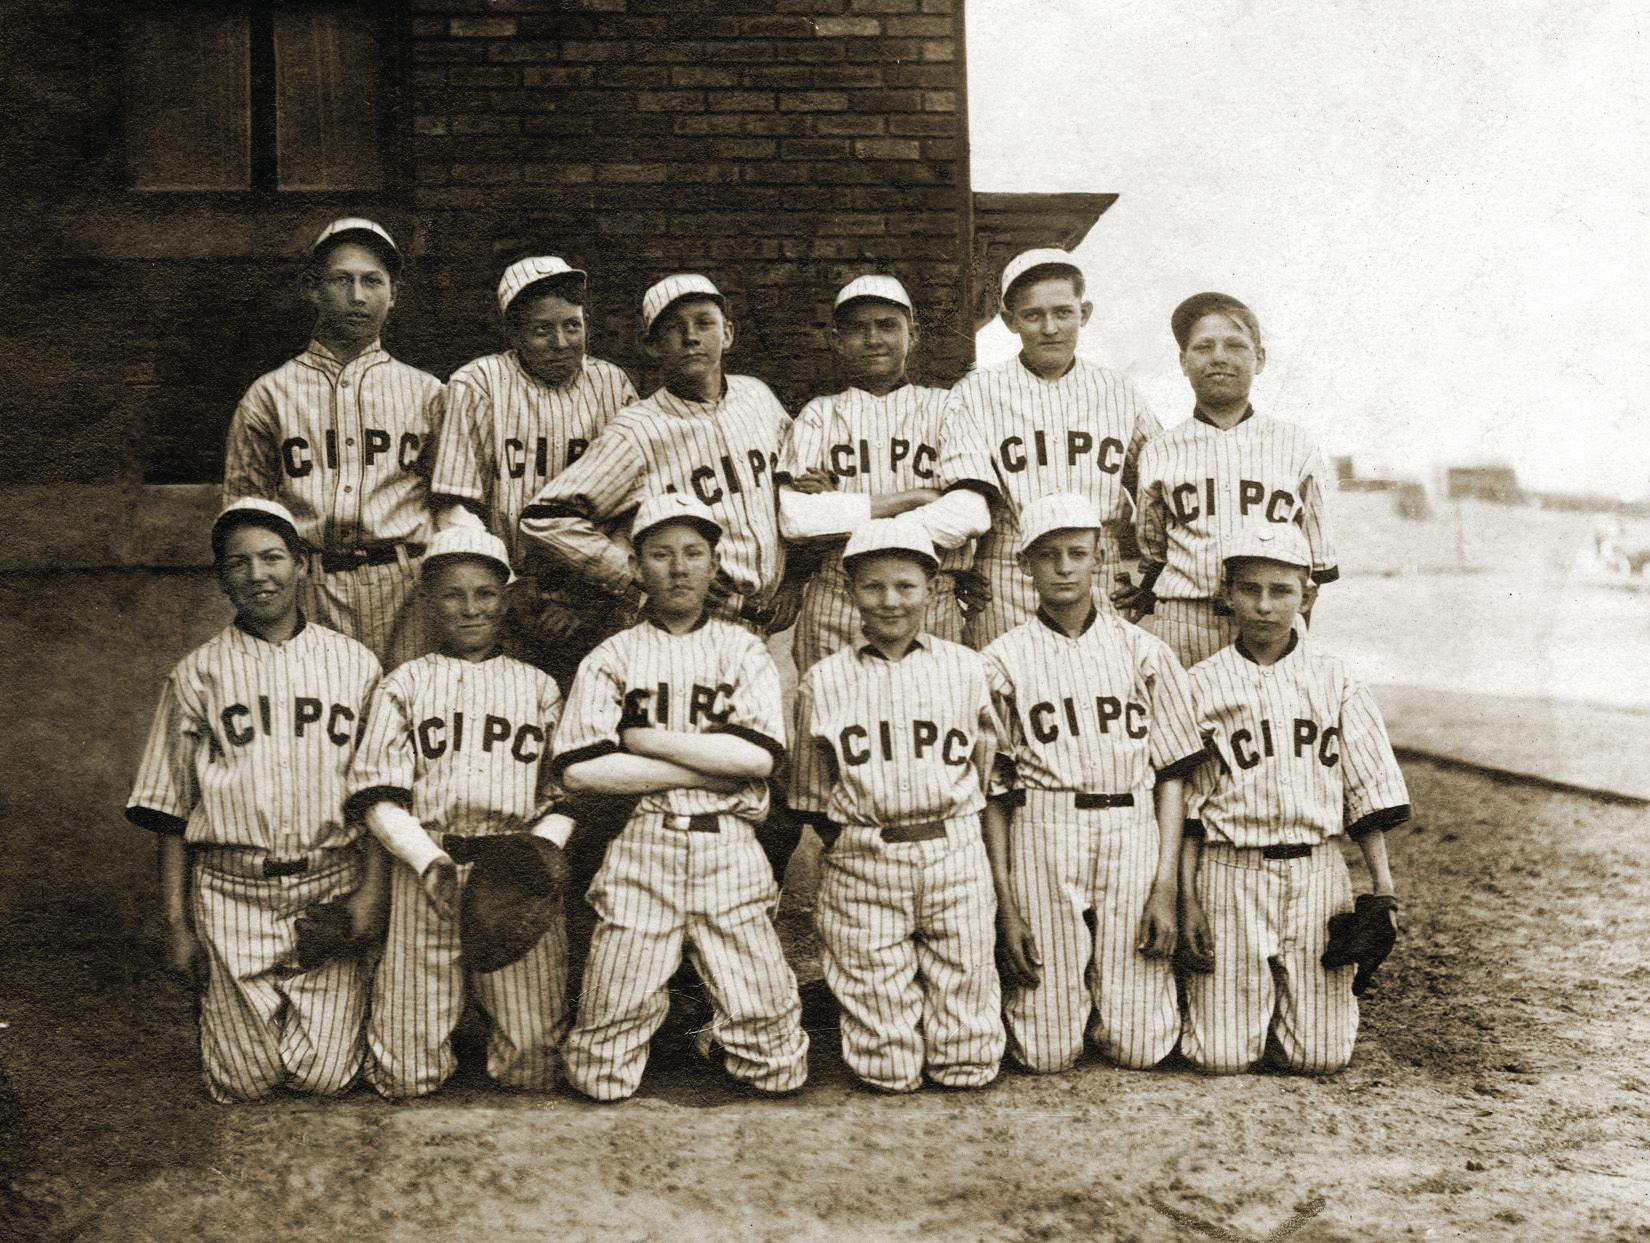 Acipco 1925 Youth Baseball Team Youth Baseball Baseball Team Teams